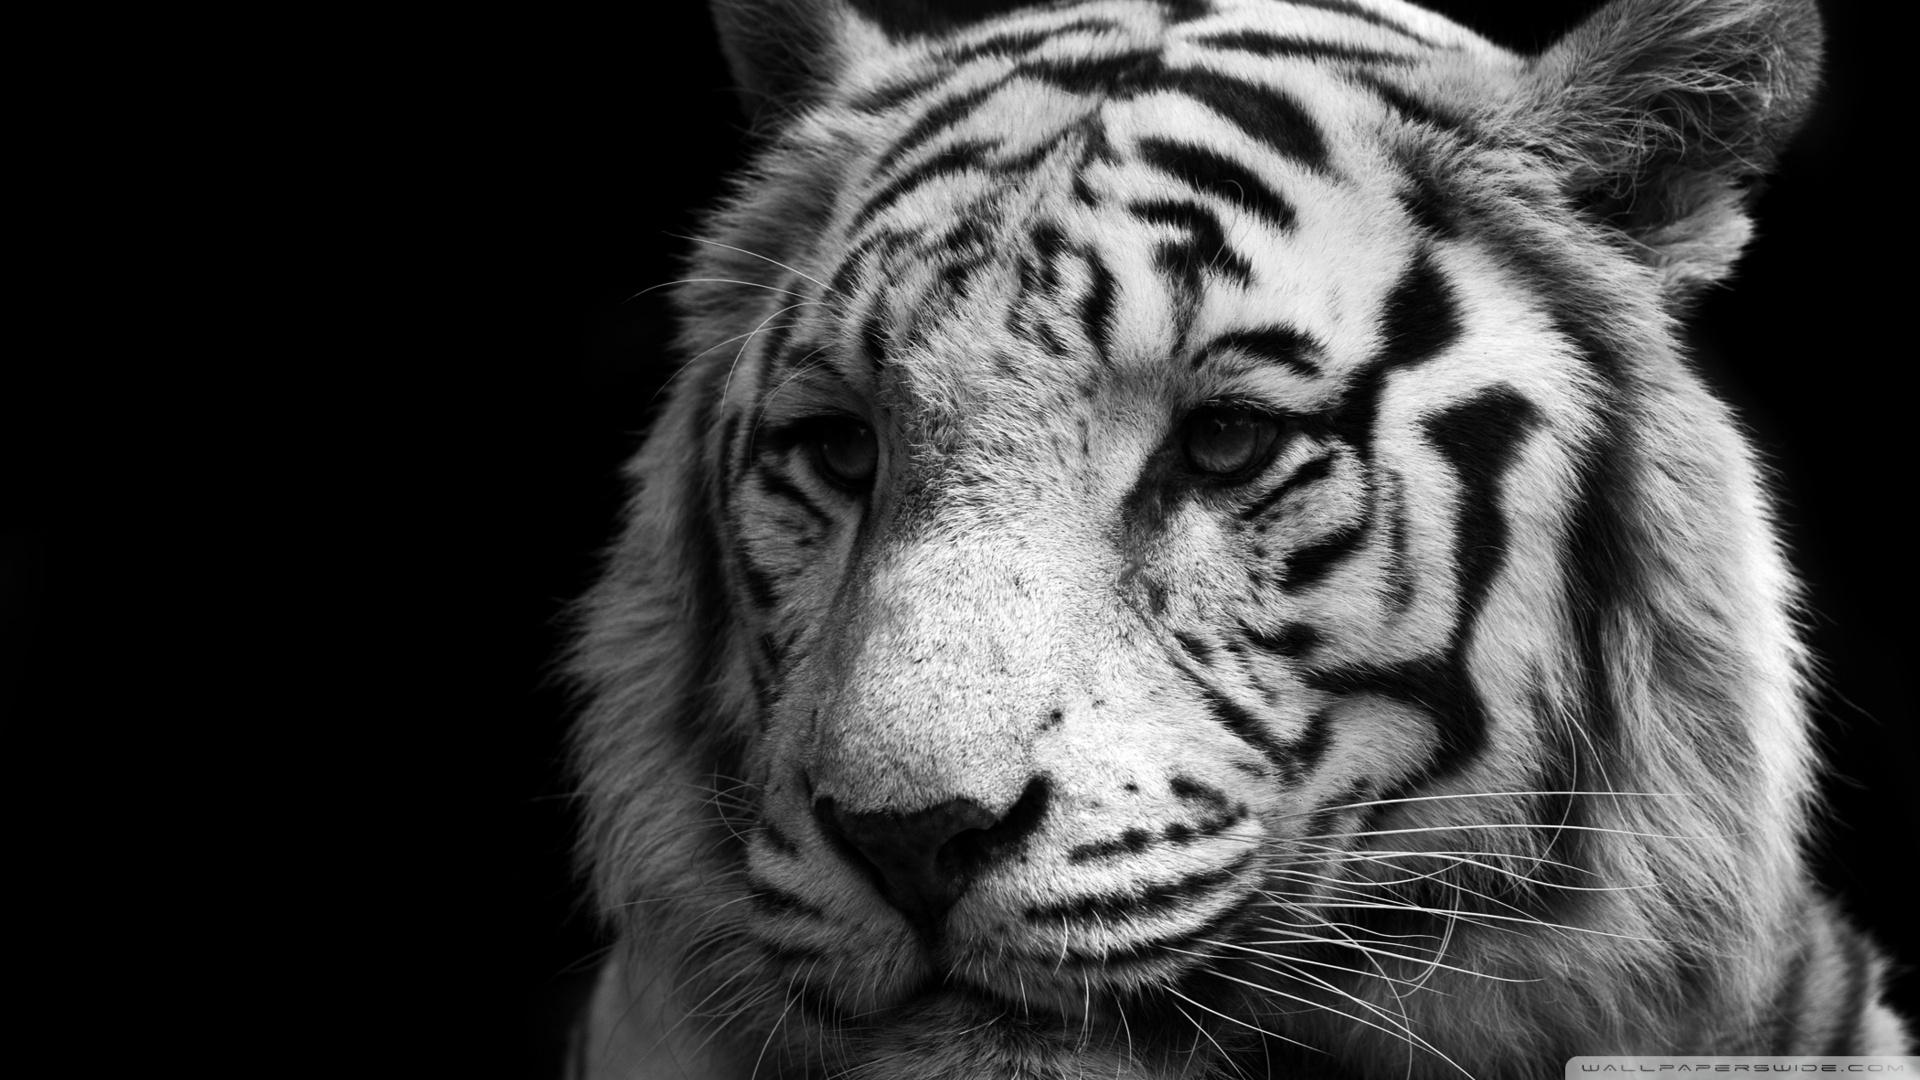 Black And White Tiger Wallpaper 1920x1080 Download Hd Wallpaper Wallpapertip